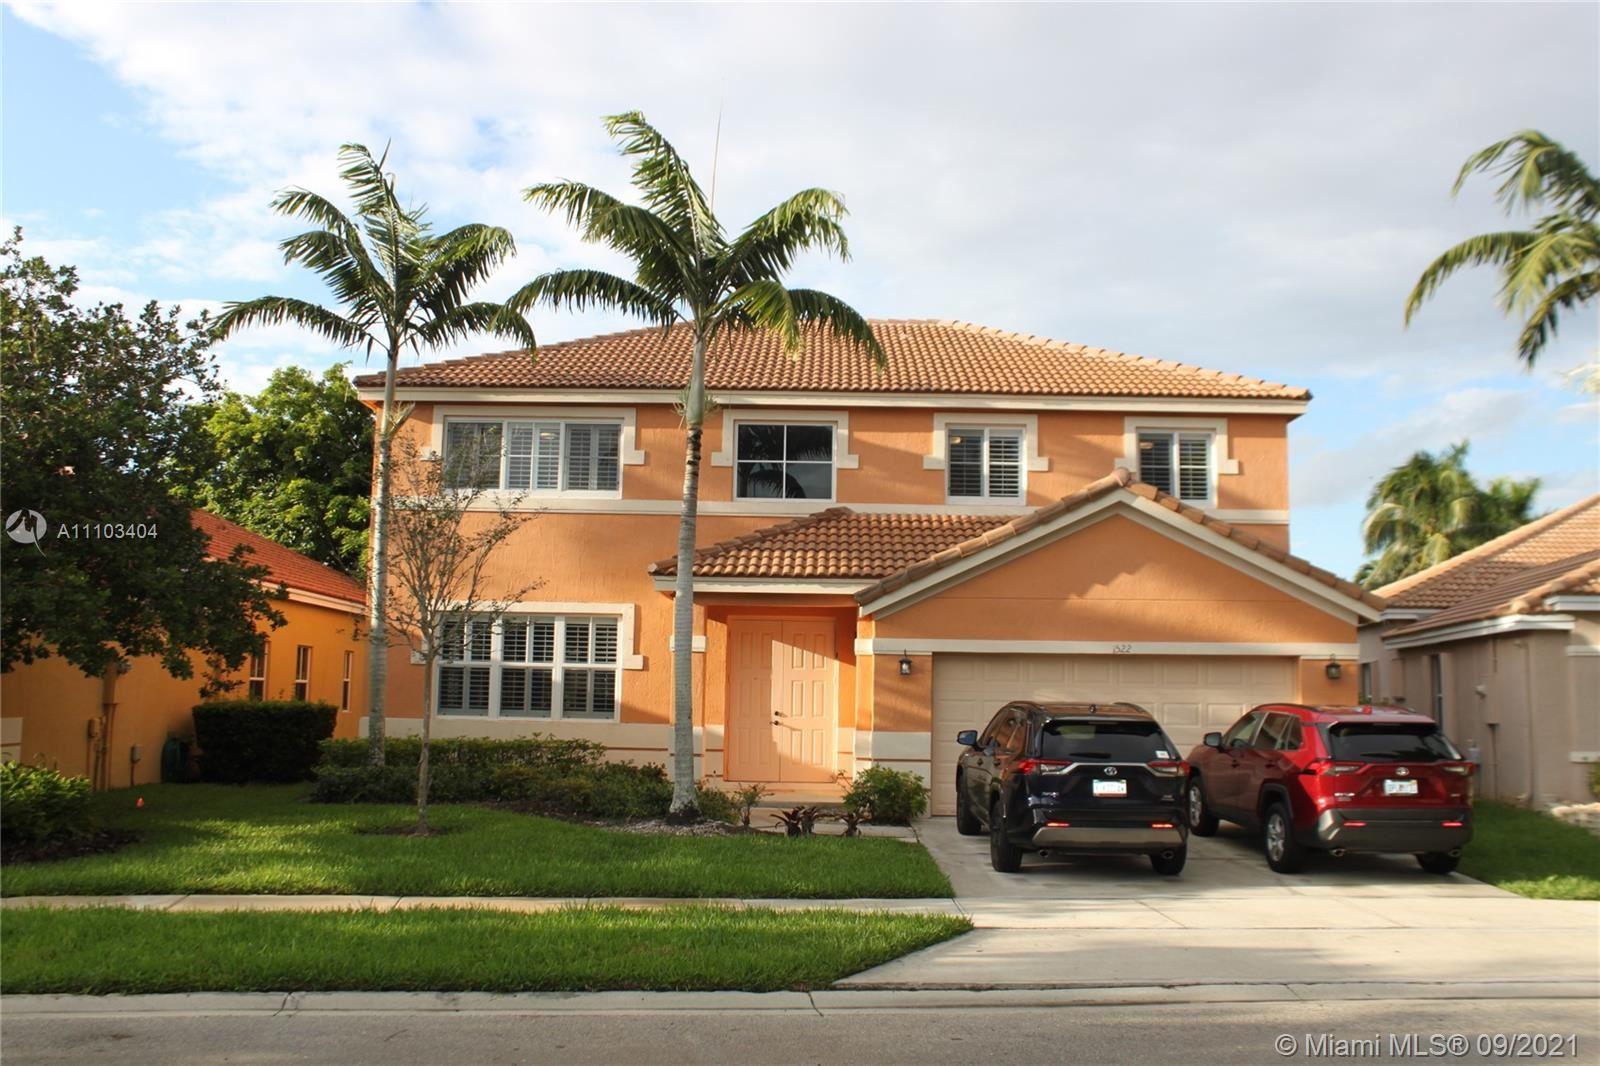 1522 Sandpiper Cir, Weston, FL 33327 - #: A11103404